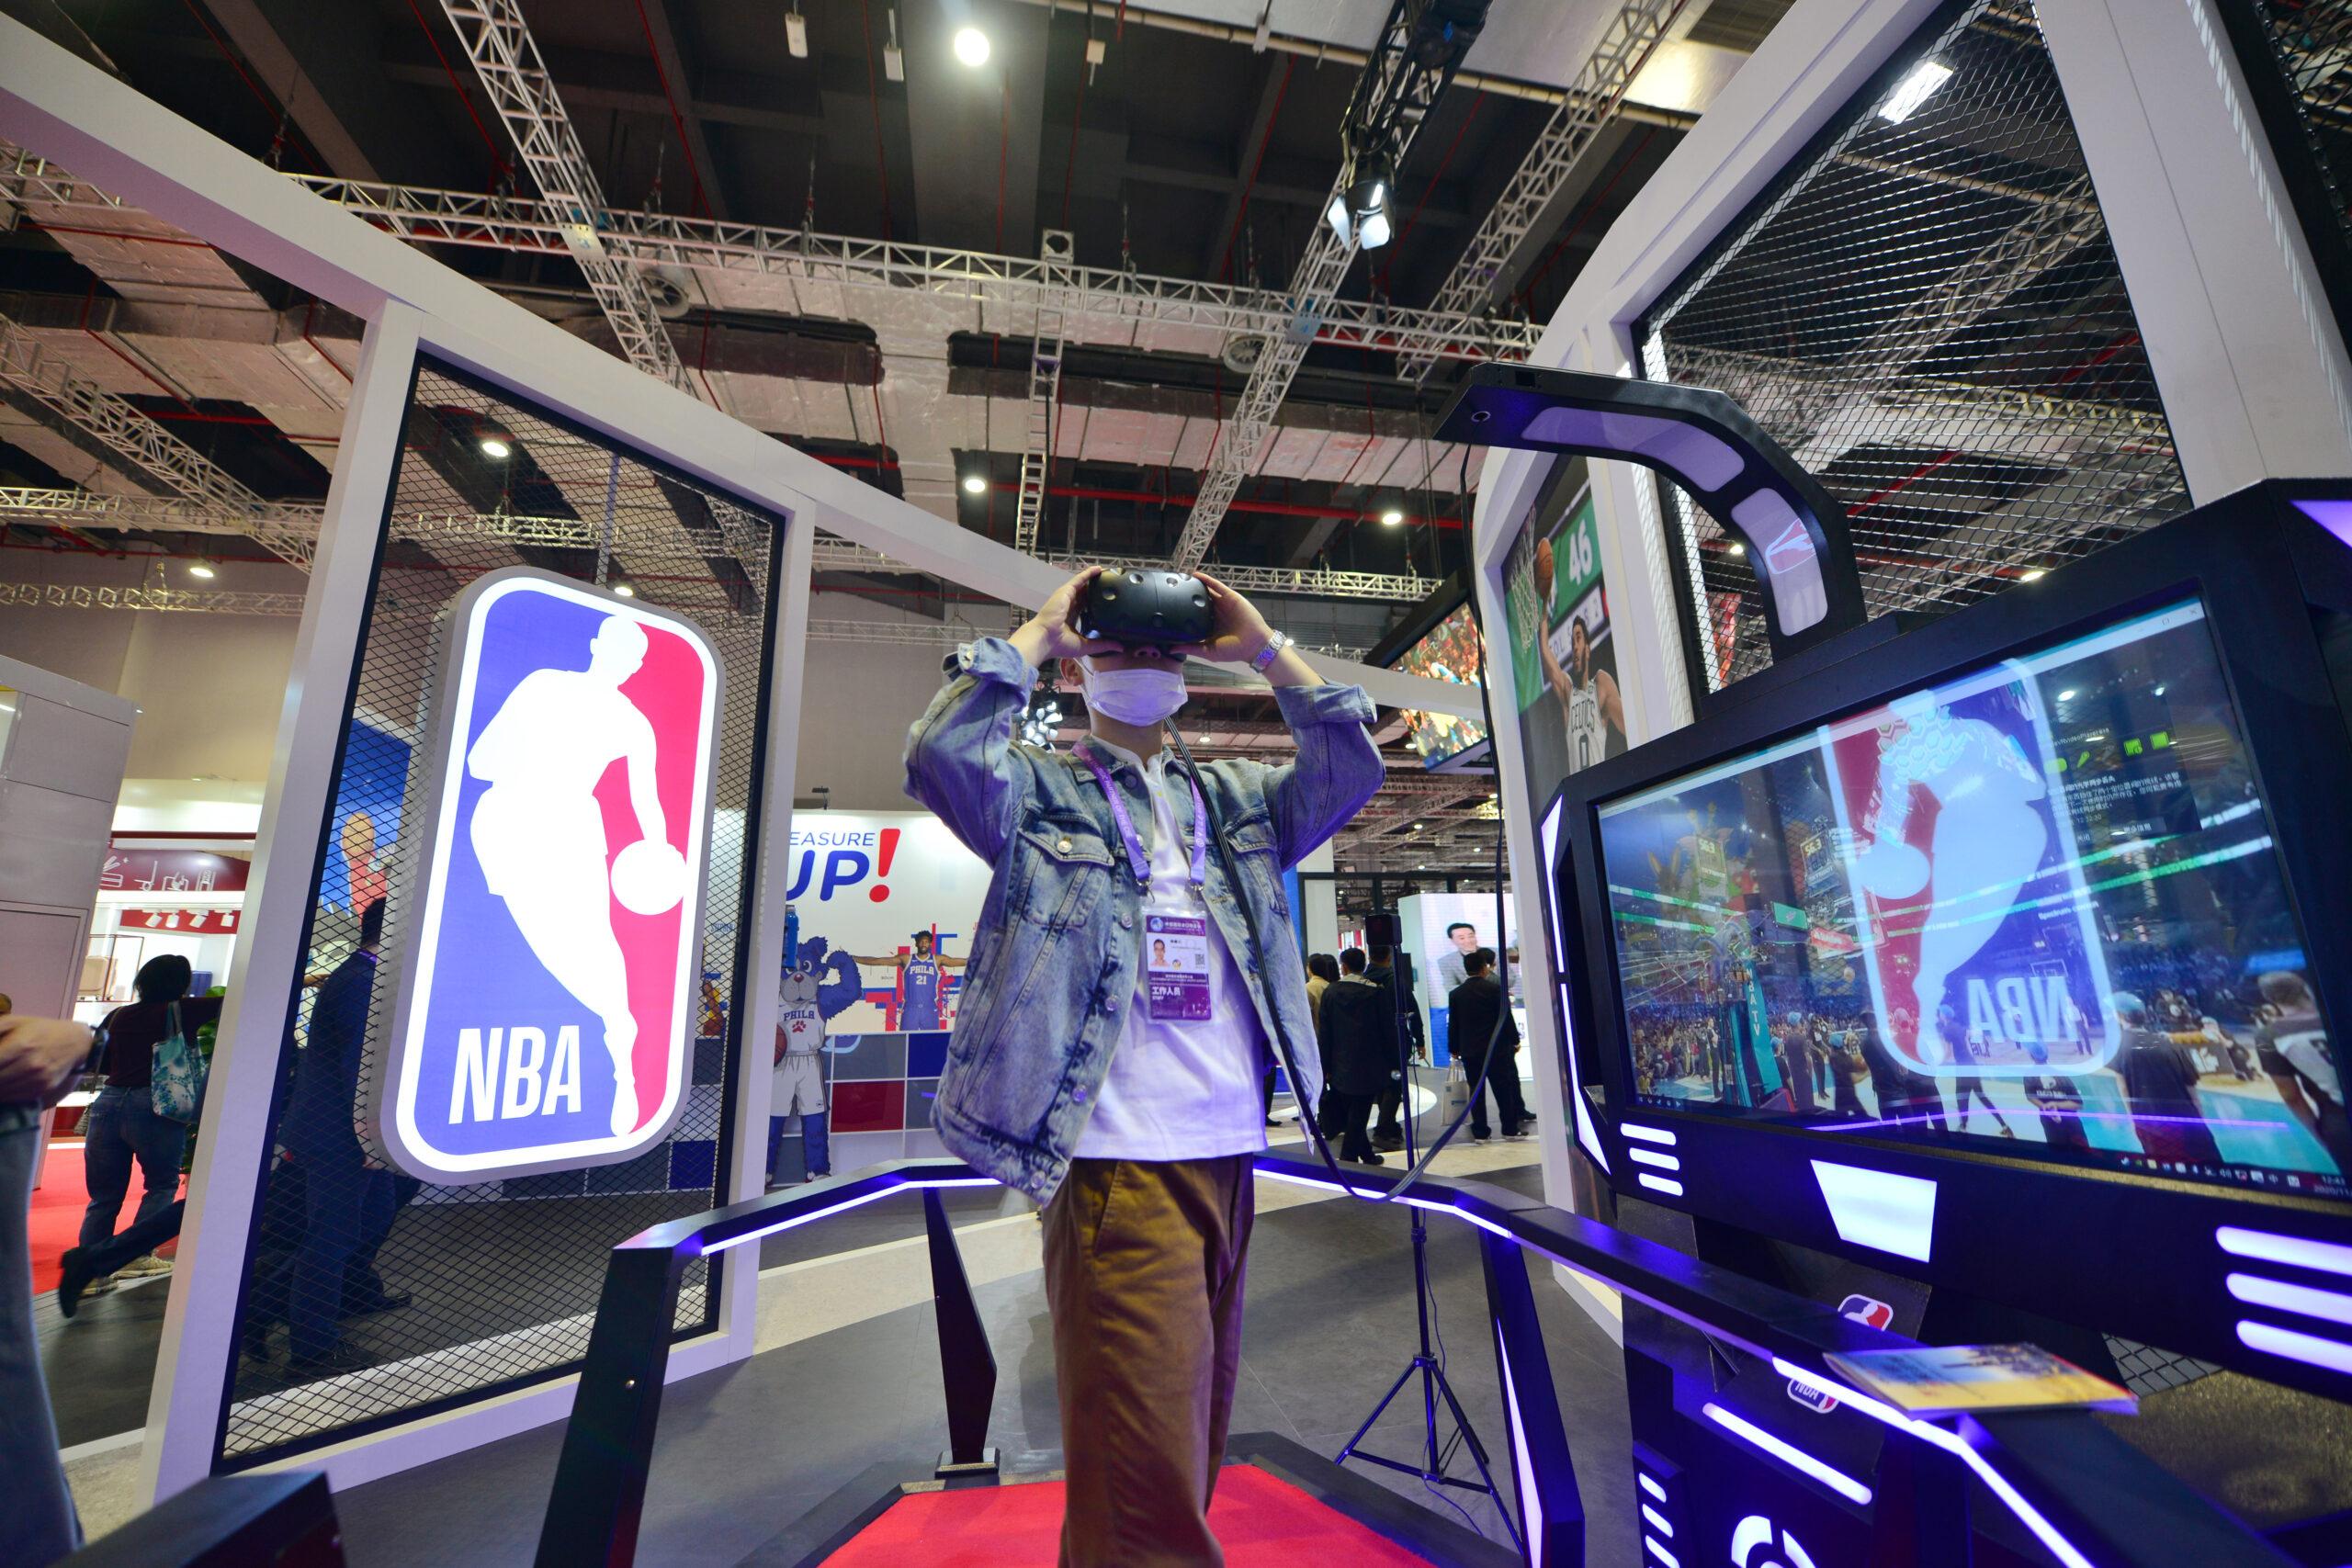 A person using the NBA virtual reality headset.